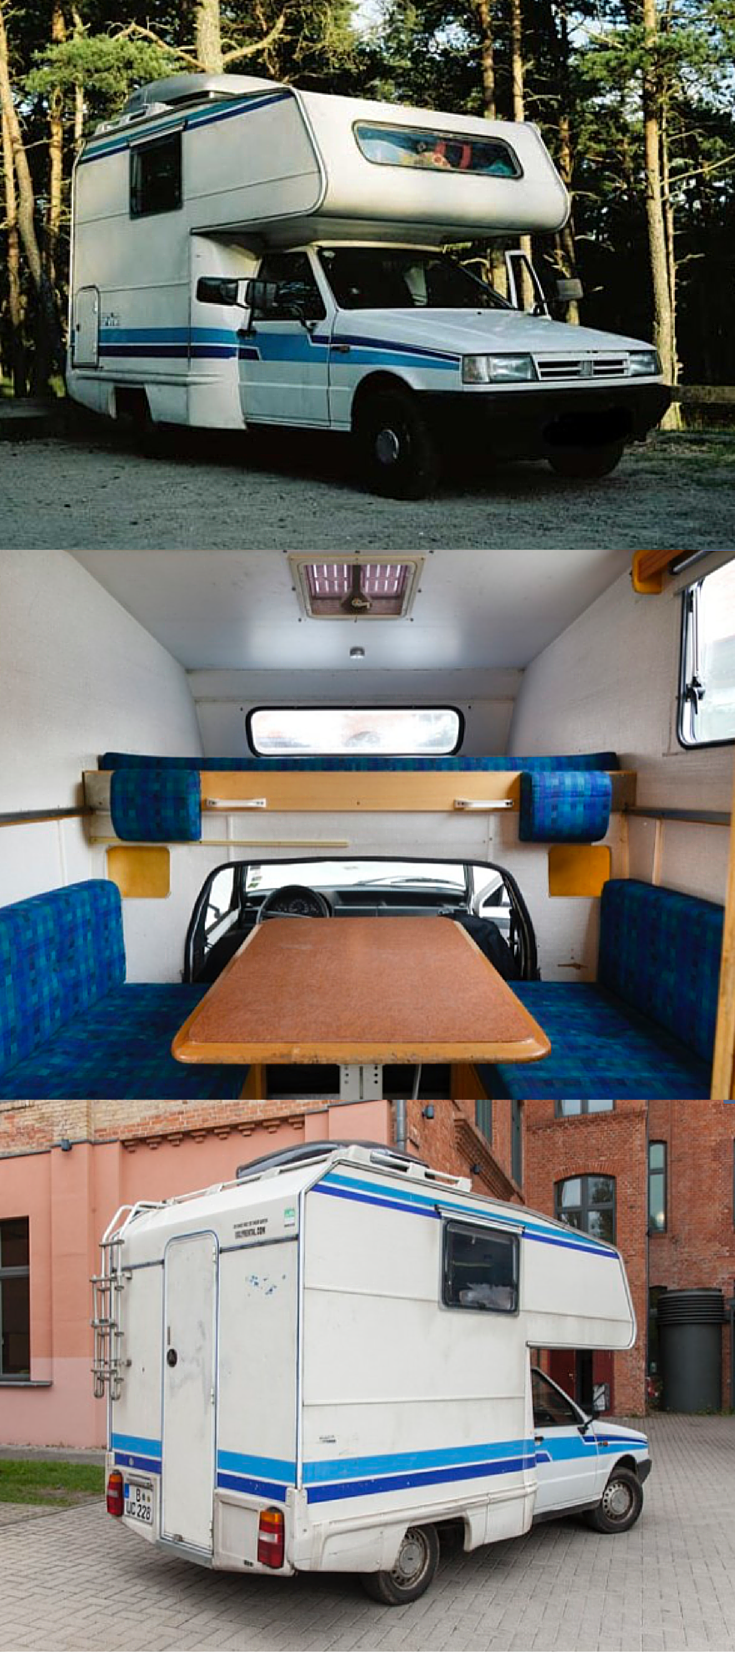 Seltenes Kultwohnmobil Fiat Fiorino Top Viva – Die mobile Zeitreise ...